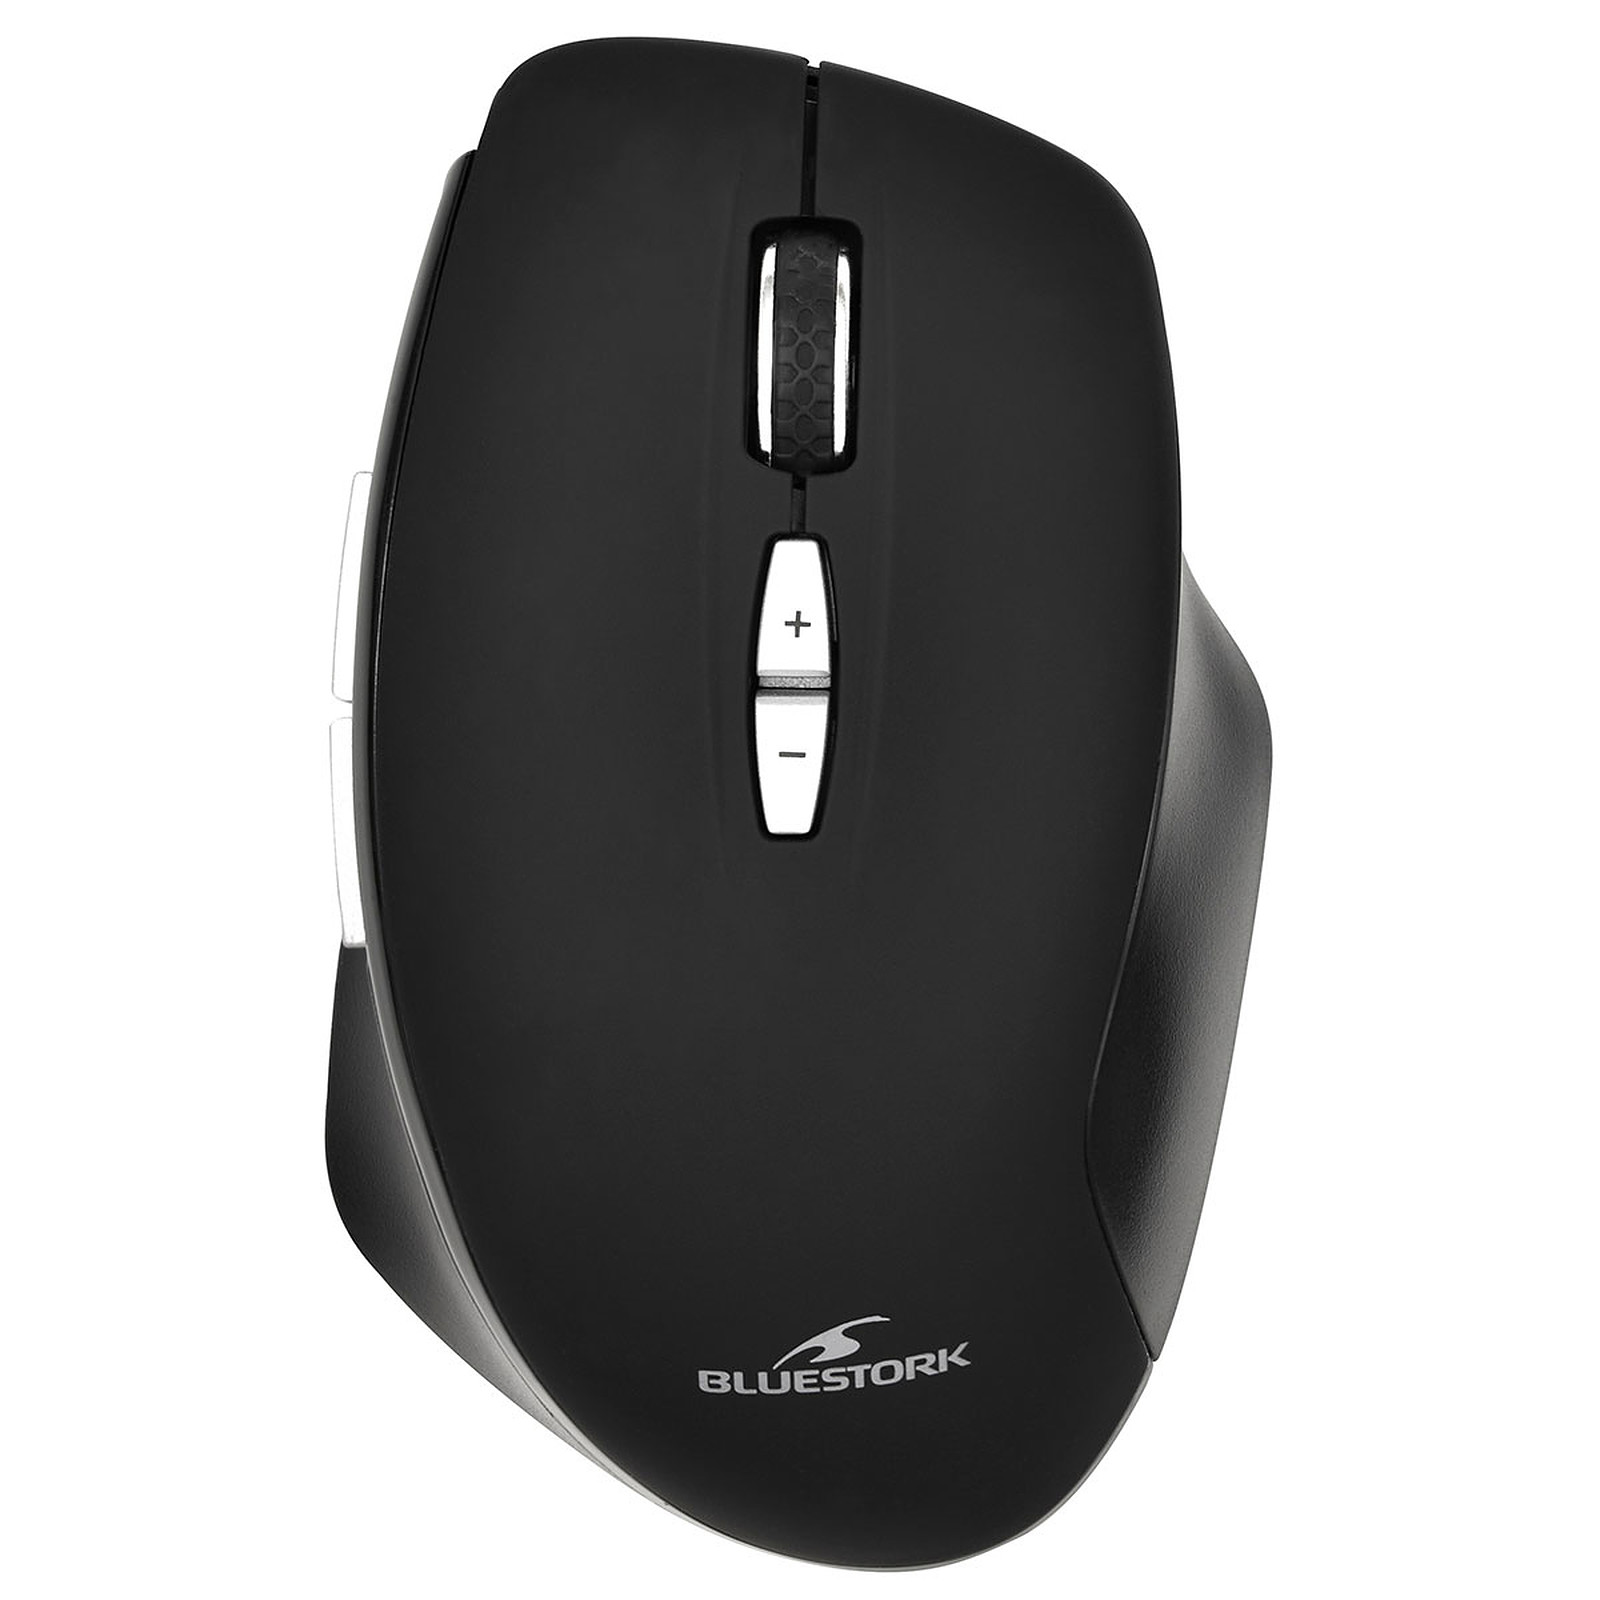 Bluestork Rechargeable Silent Wireless Mouse